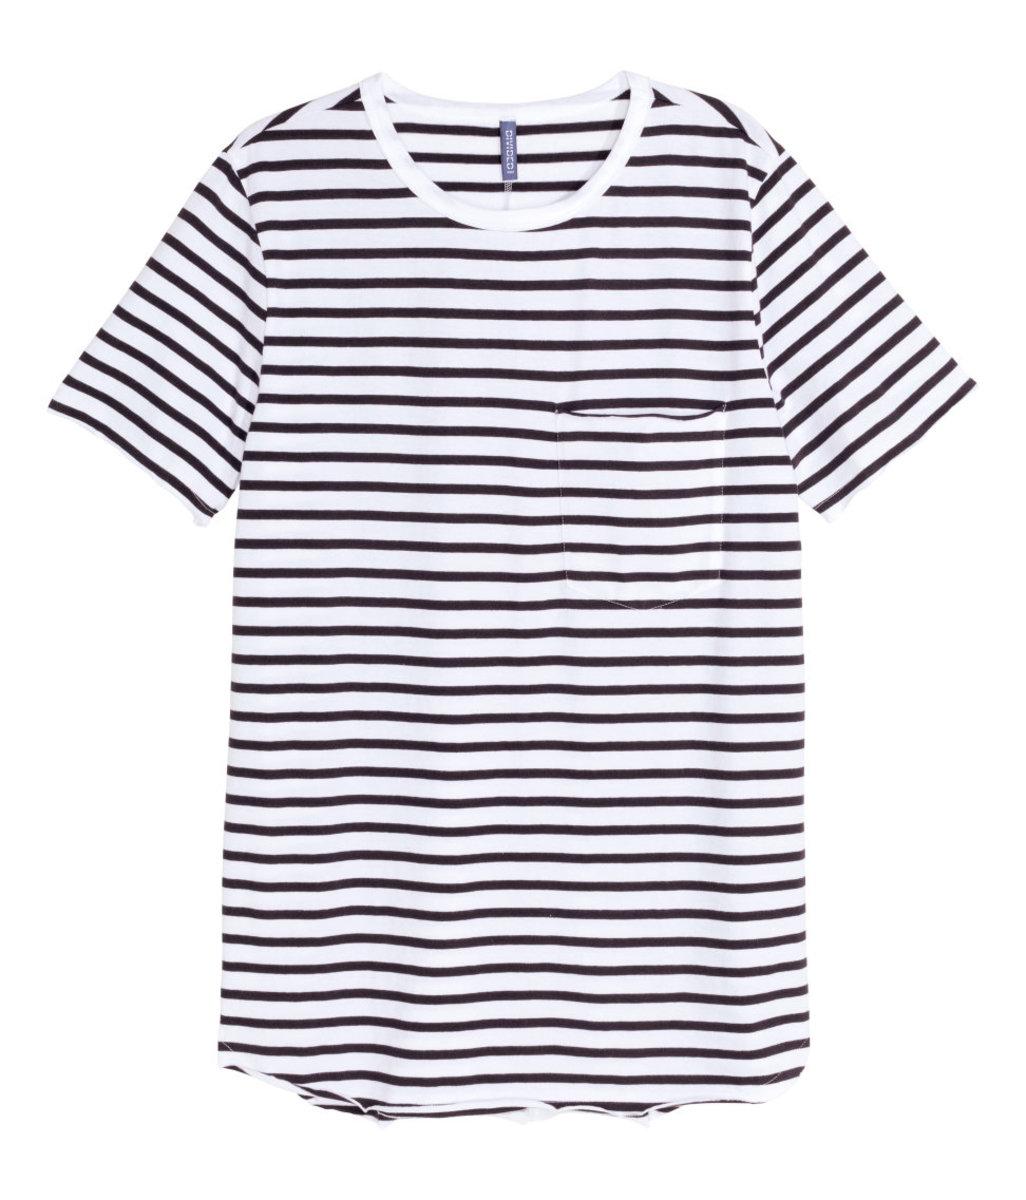 H&M long men's T-shirt, $9.99, available at H&M.